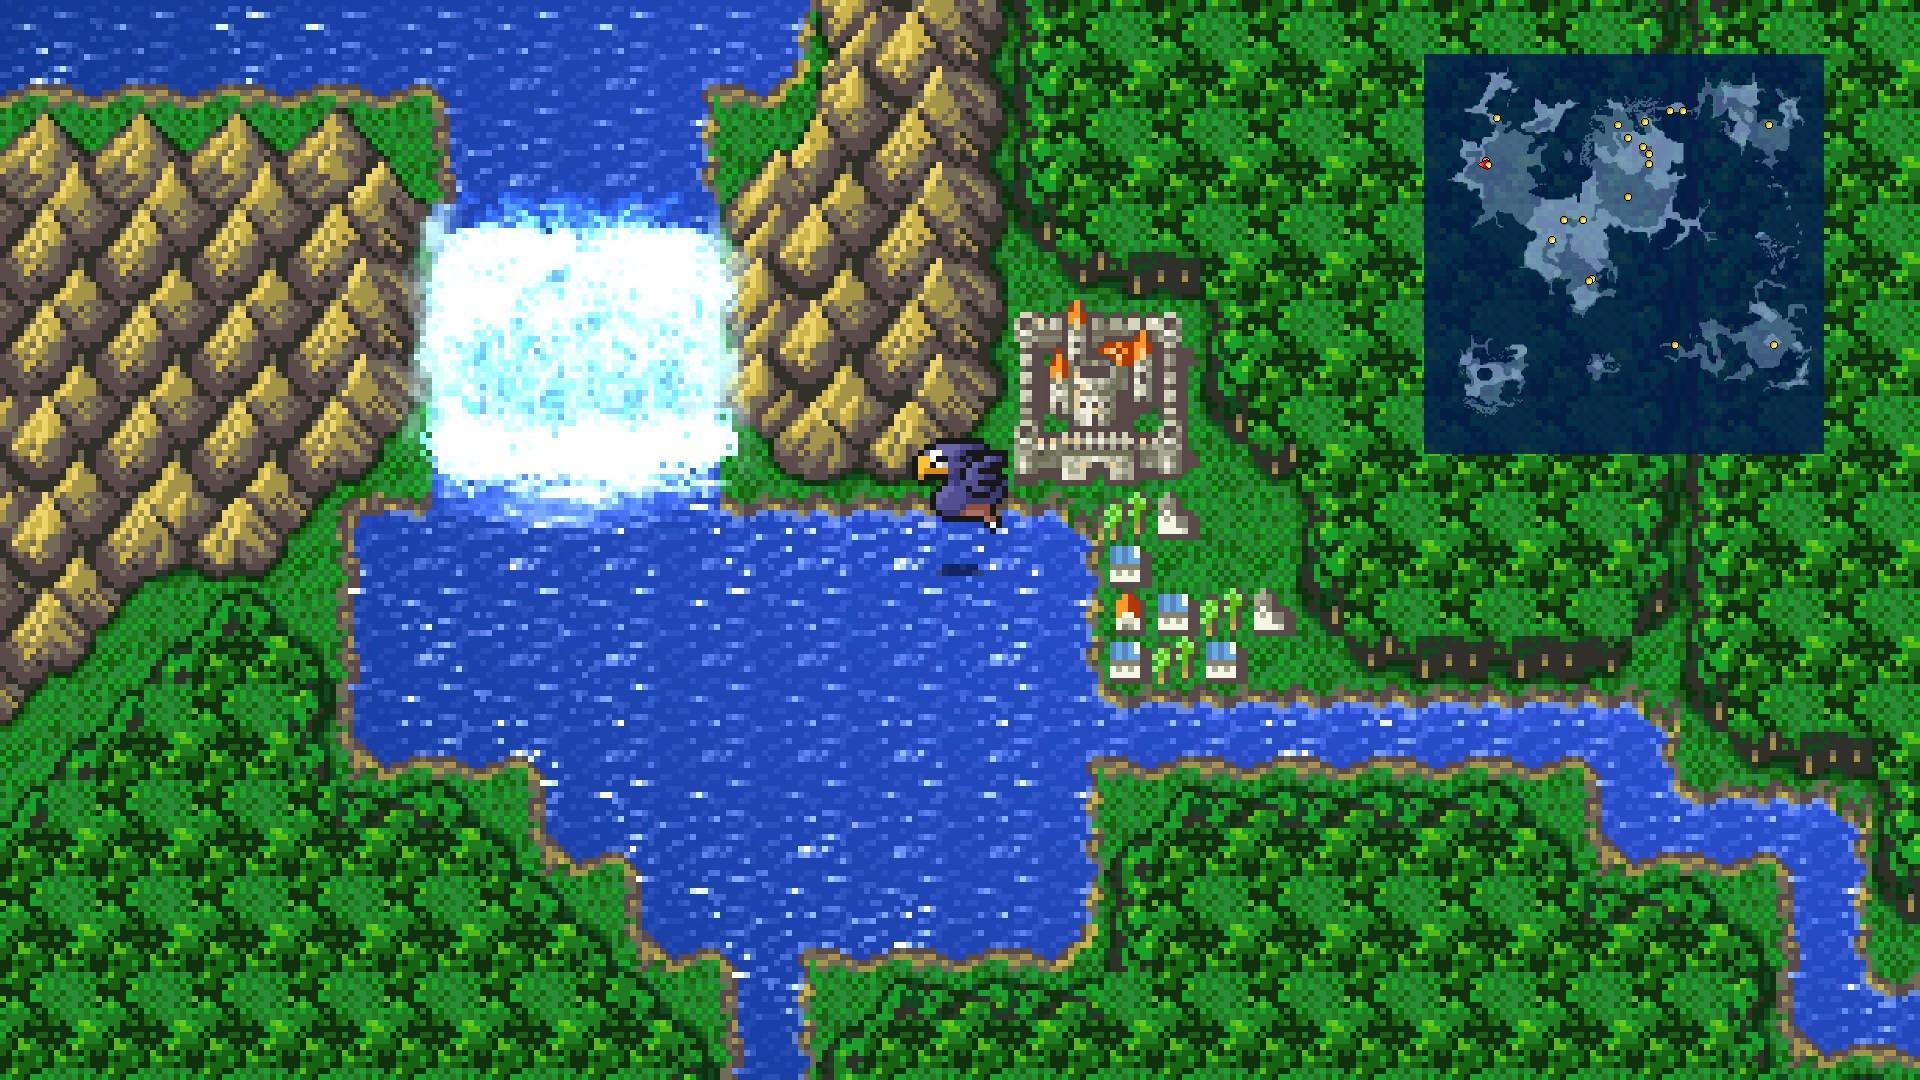 final-fantasy-4-pc-screenshot-1